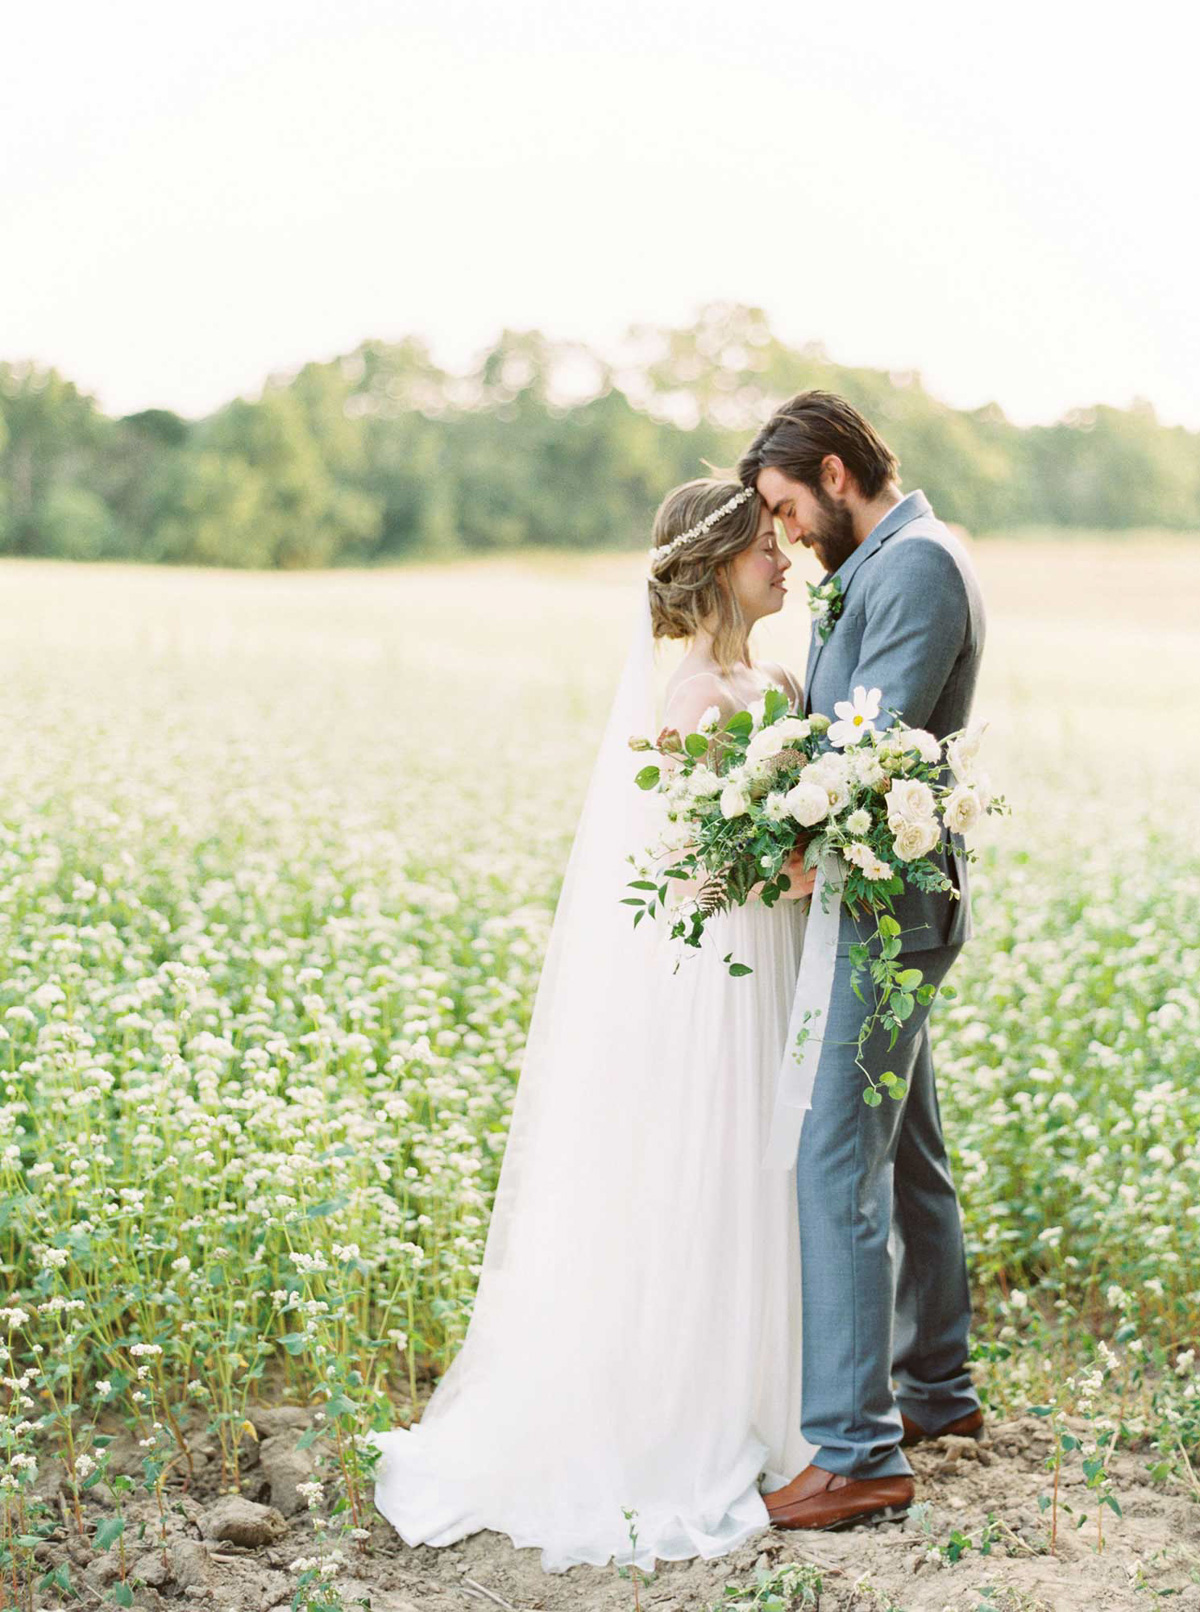 kayla-yestal-vineyard-bride-swish-list-woodland-weddings-niagara-wedding-editorial-29.jpg